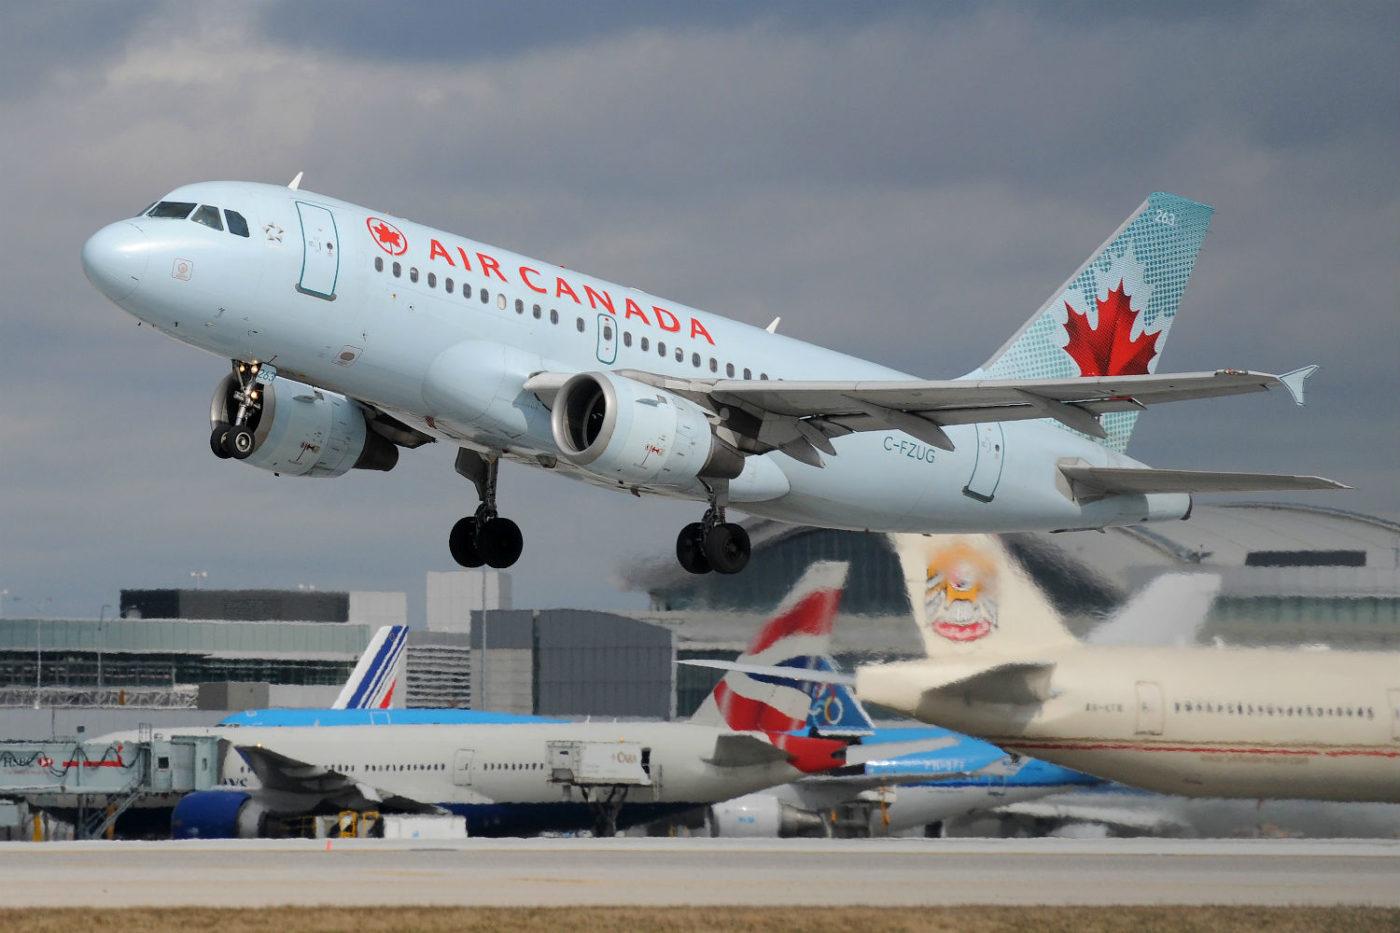 Air Canada A319 in flight.